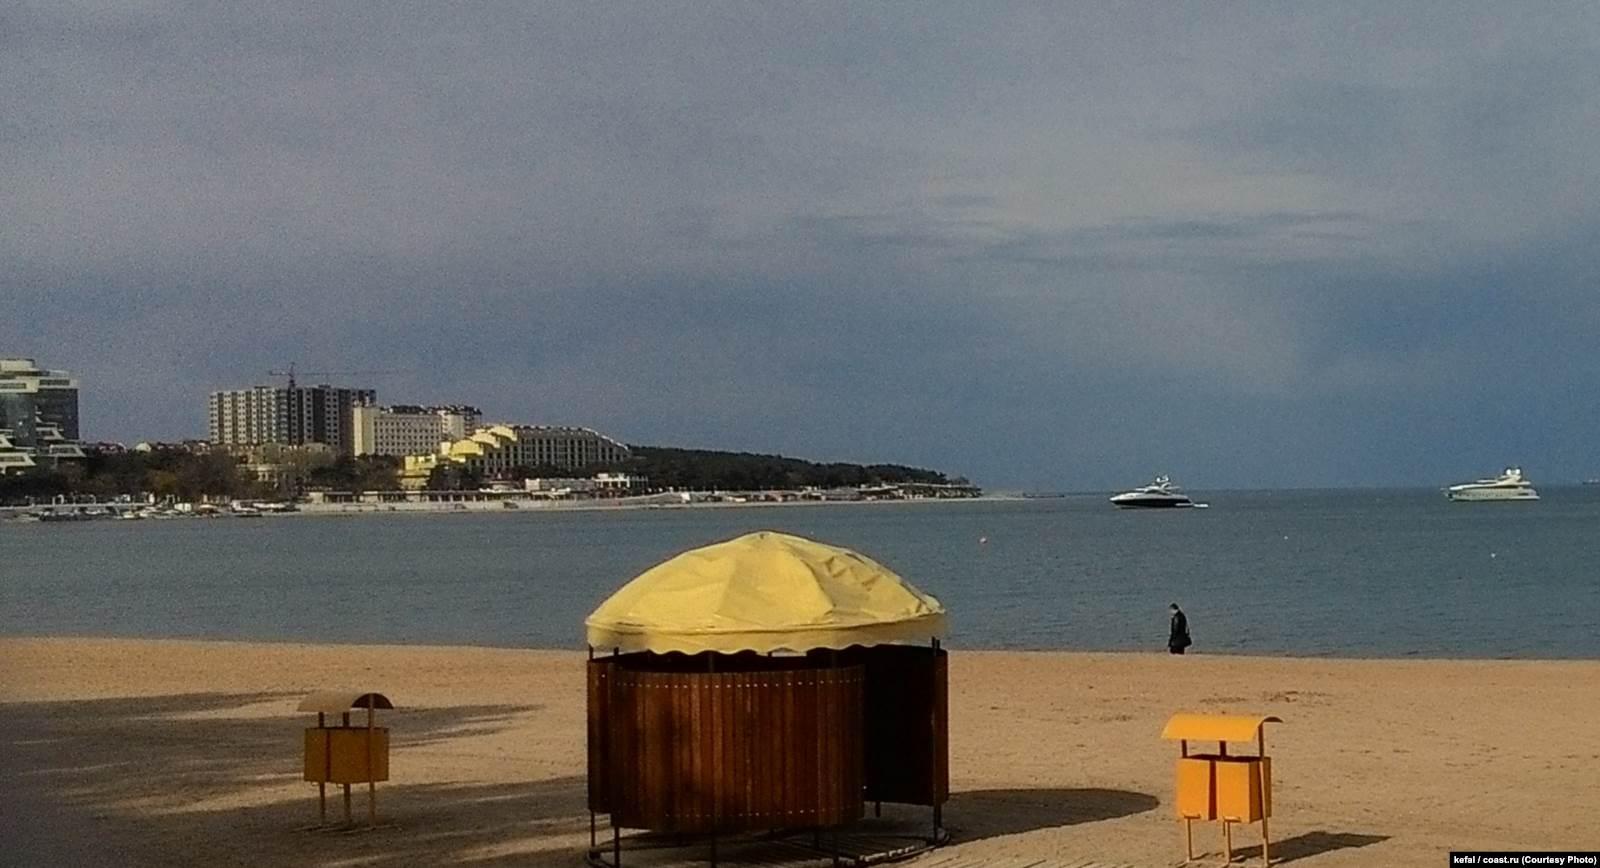 Яхты Stormbringer (слева) и St. Vitamin (справа) в Геленджикской бухте. Фото: форум coast.ru